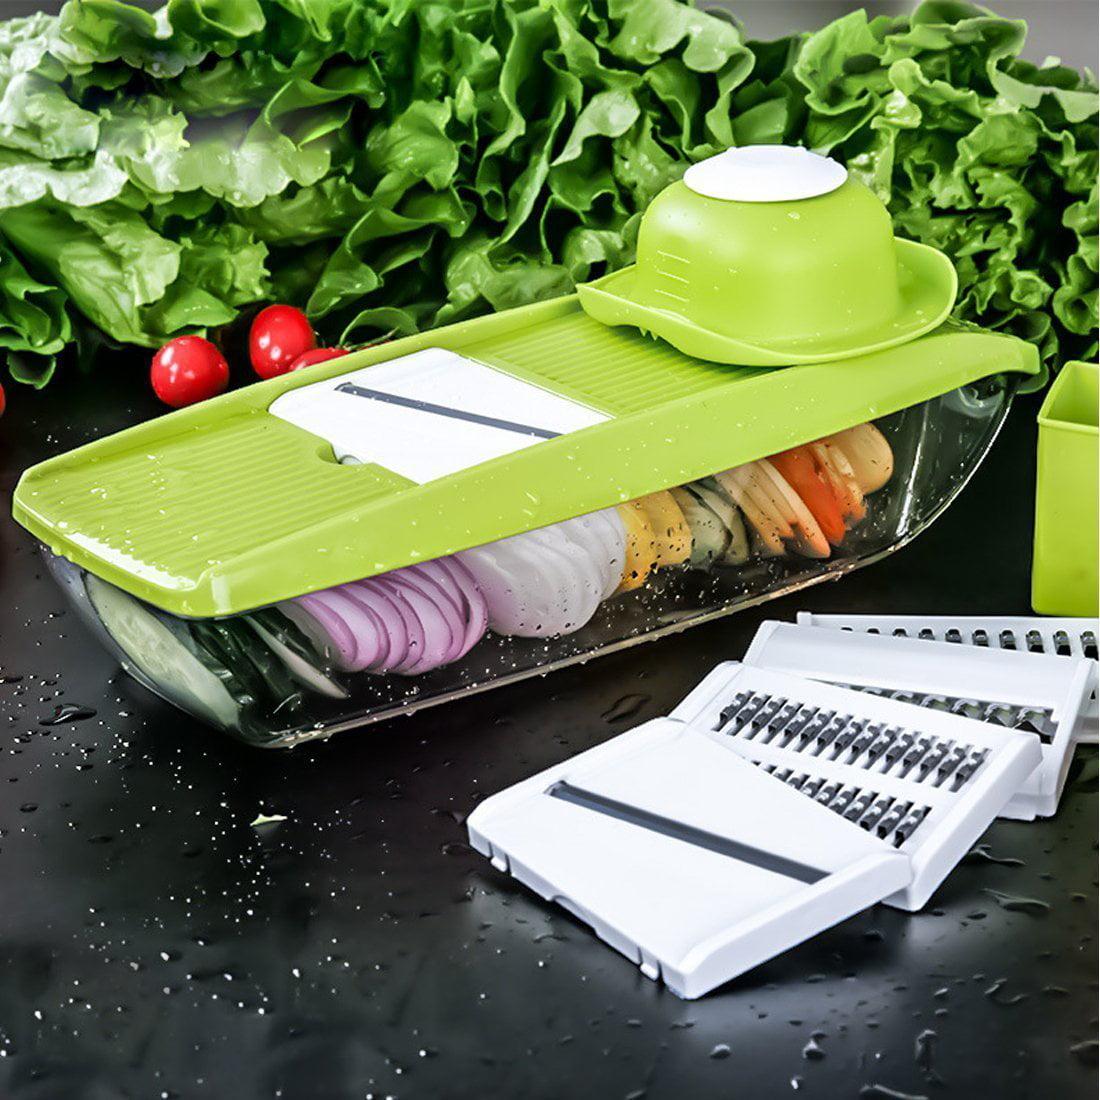 Mandoline Slicer Interchangeable(5-in-1) Adjustable Stainless Steel Blades -Vegetable Peeler Slicer, Food Container